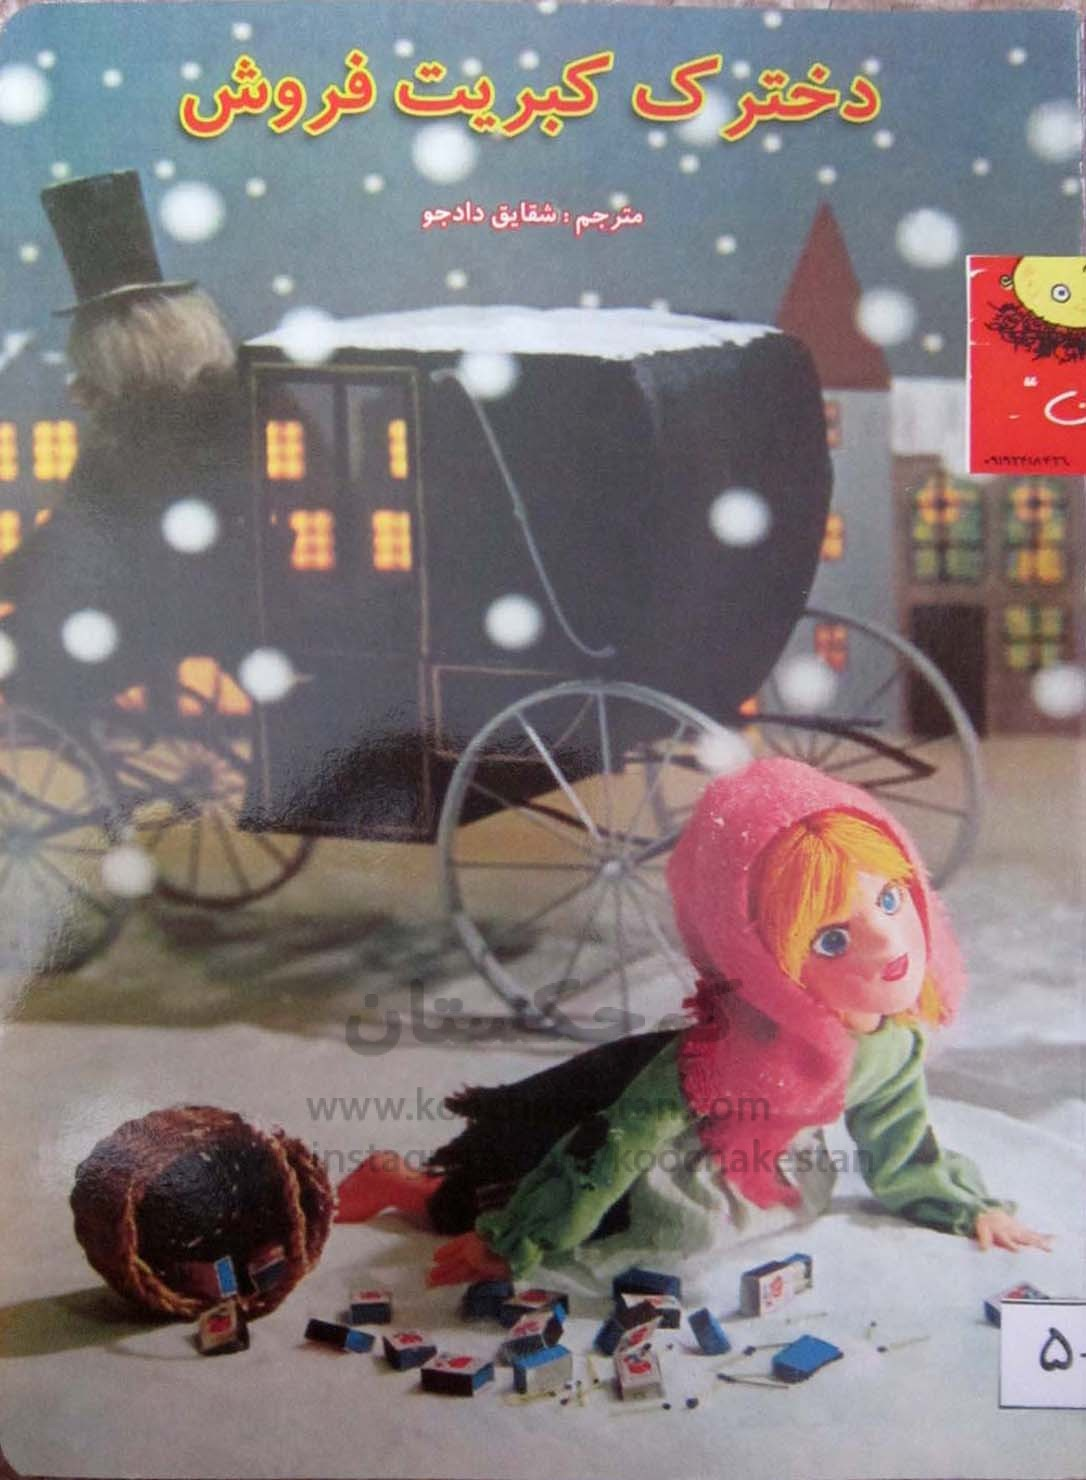 دخترک کبریت فروش - کتابخانه کودک - کوچکستان